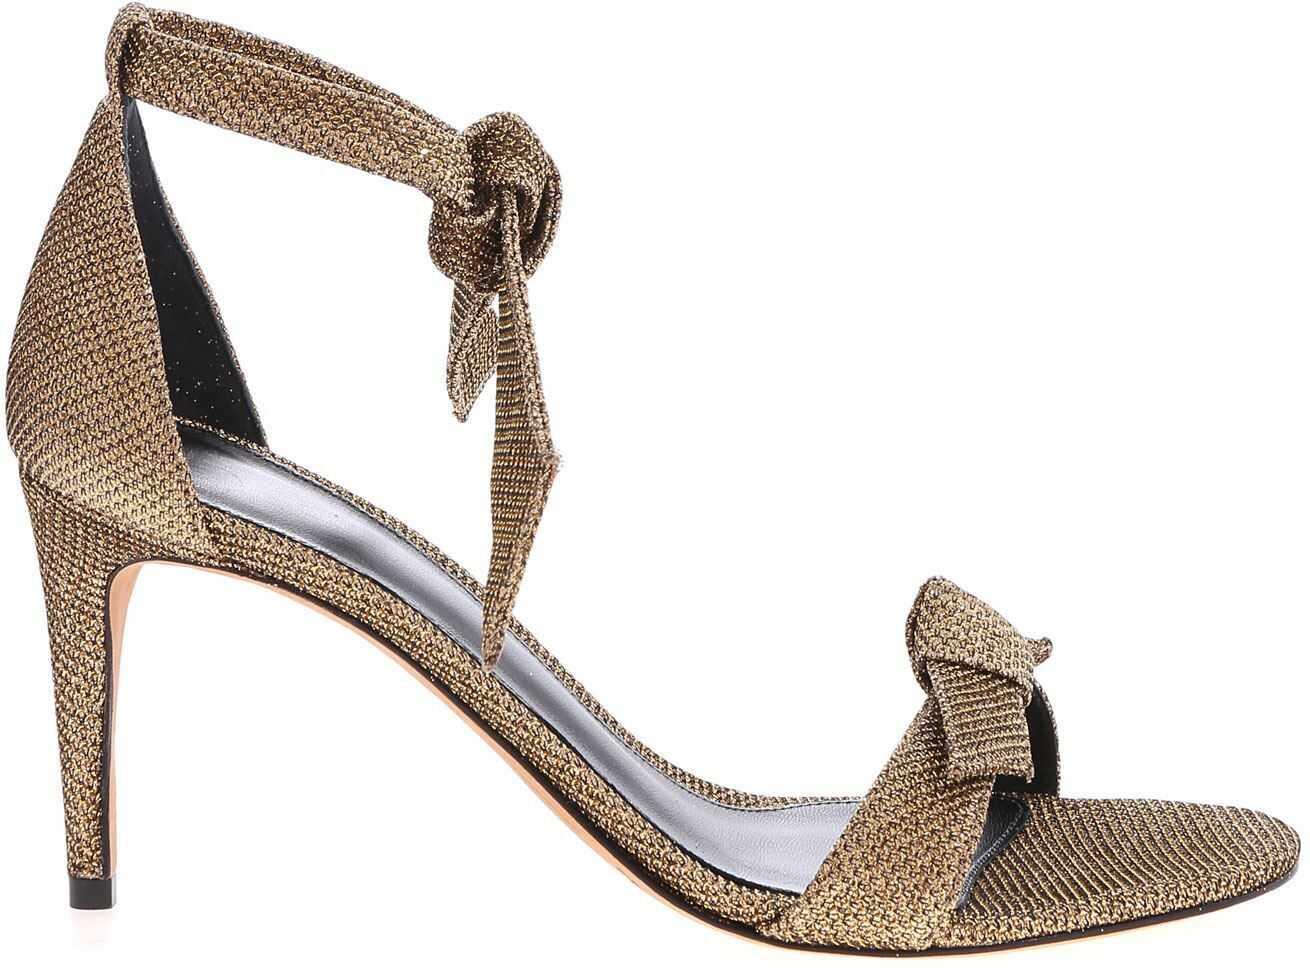 Alexandre Birman Clarita 75 Sandals In Gold Gold